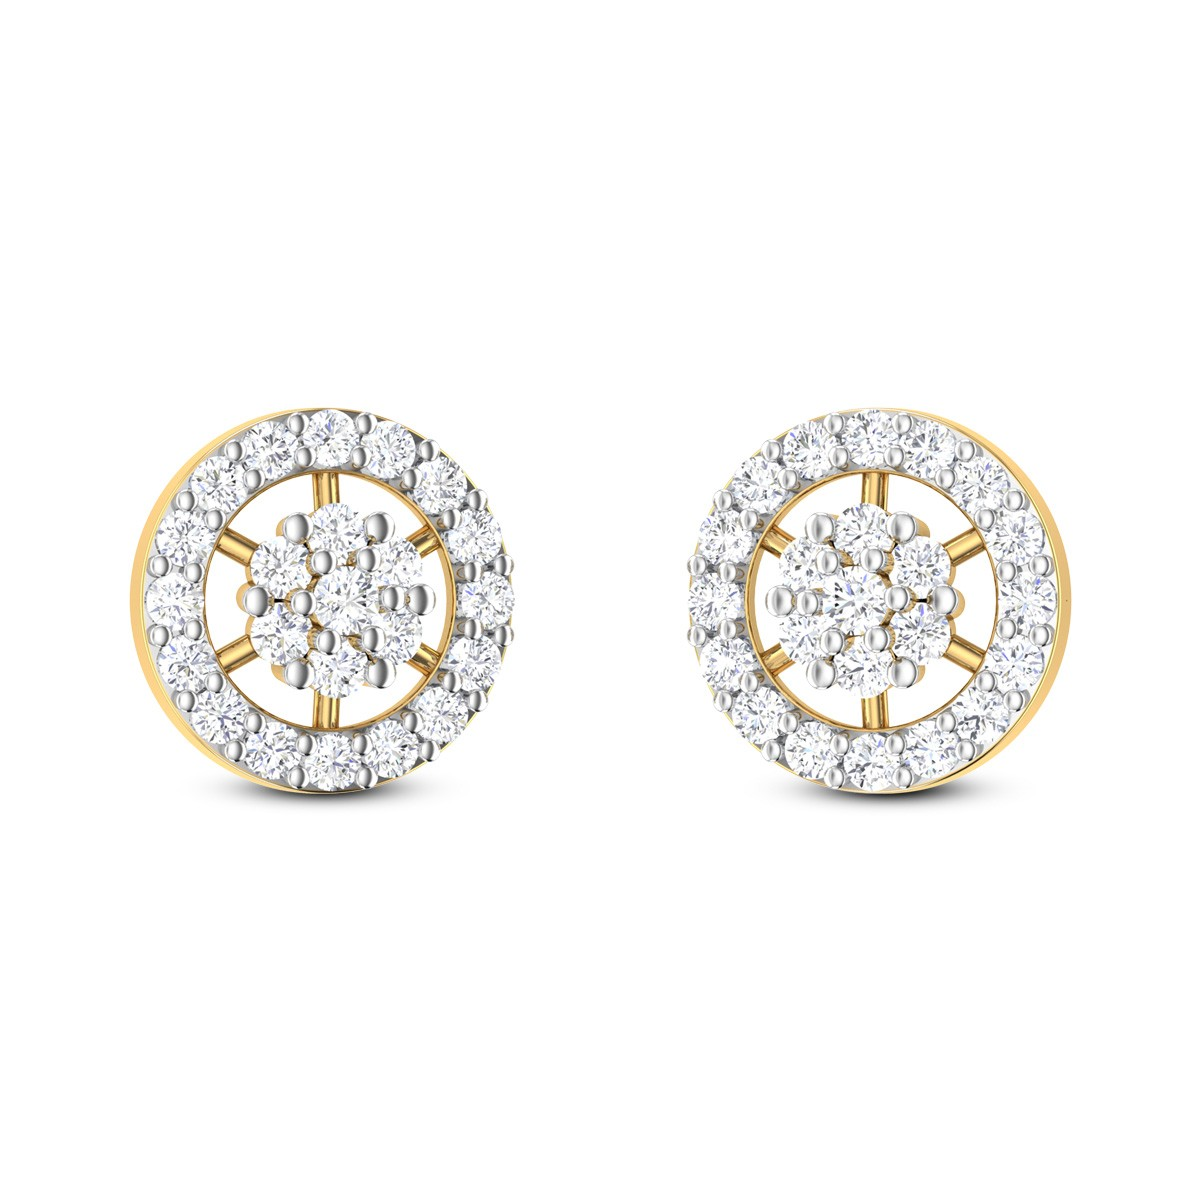 Belinda Diamond Earrings